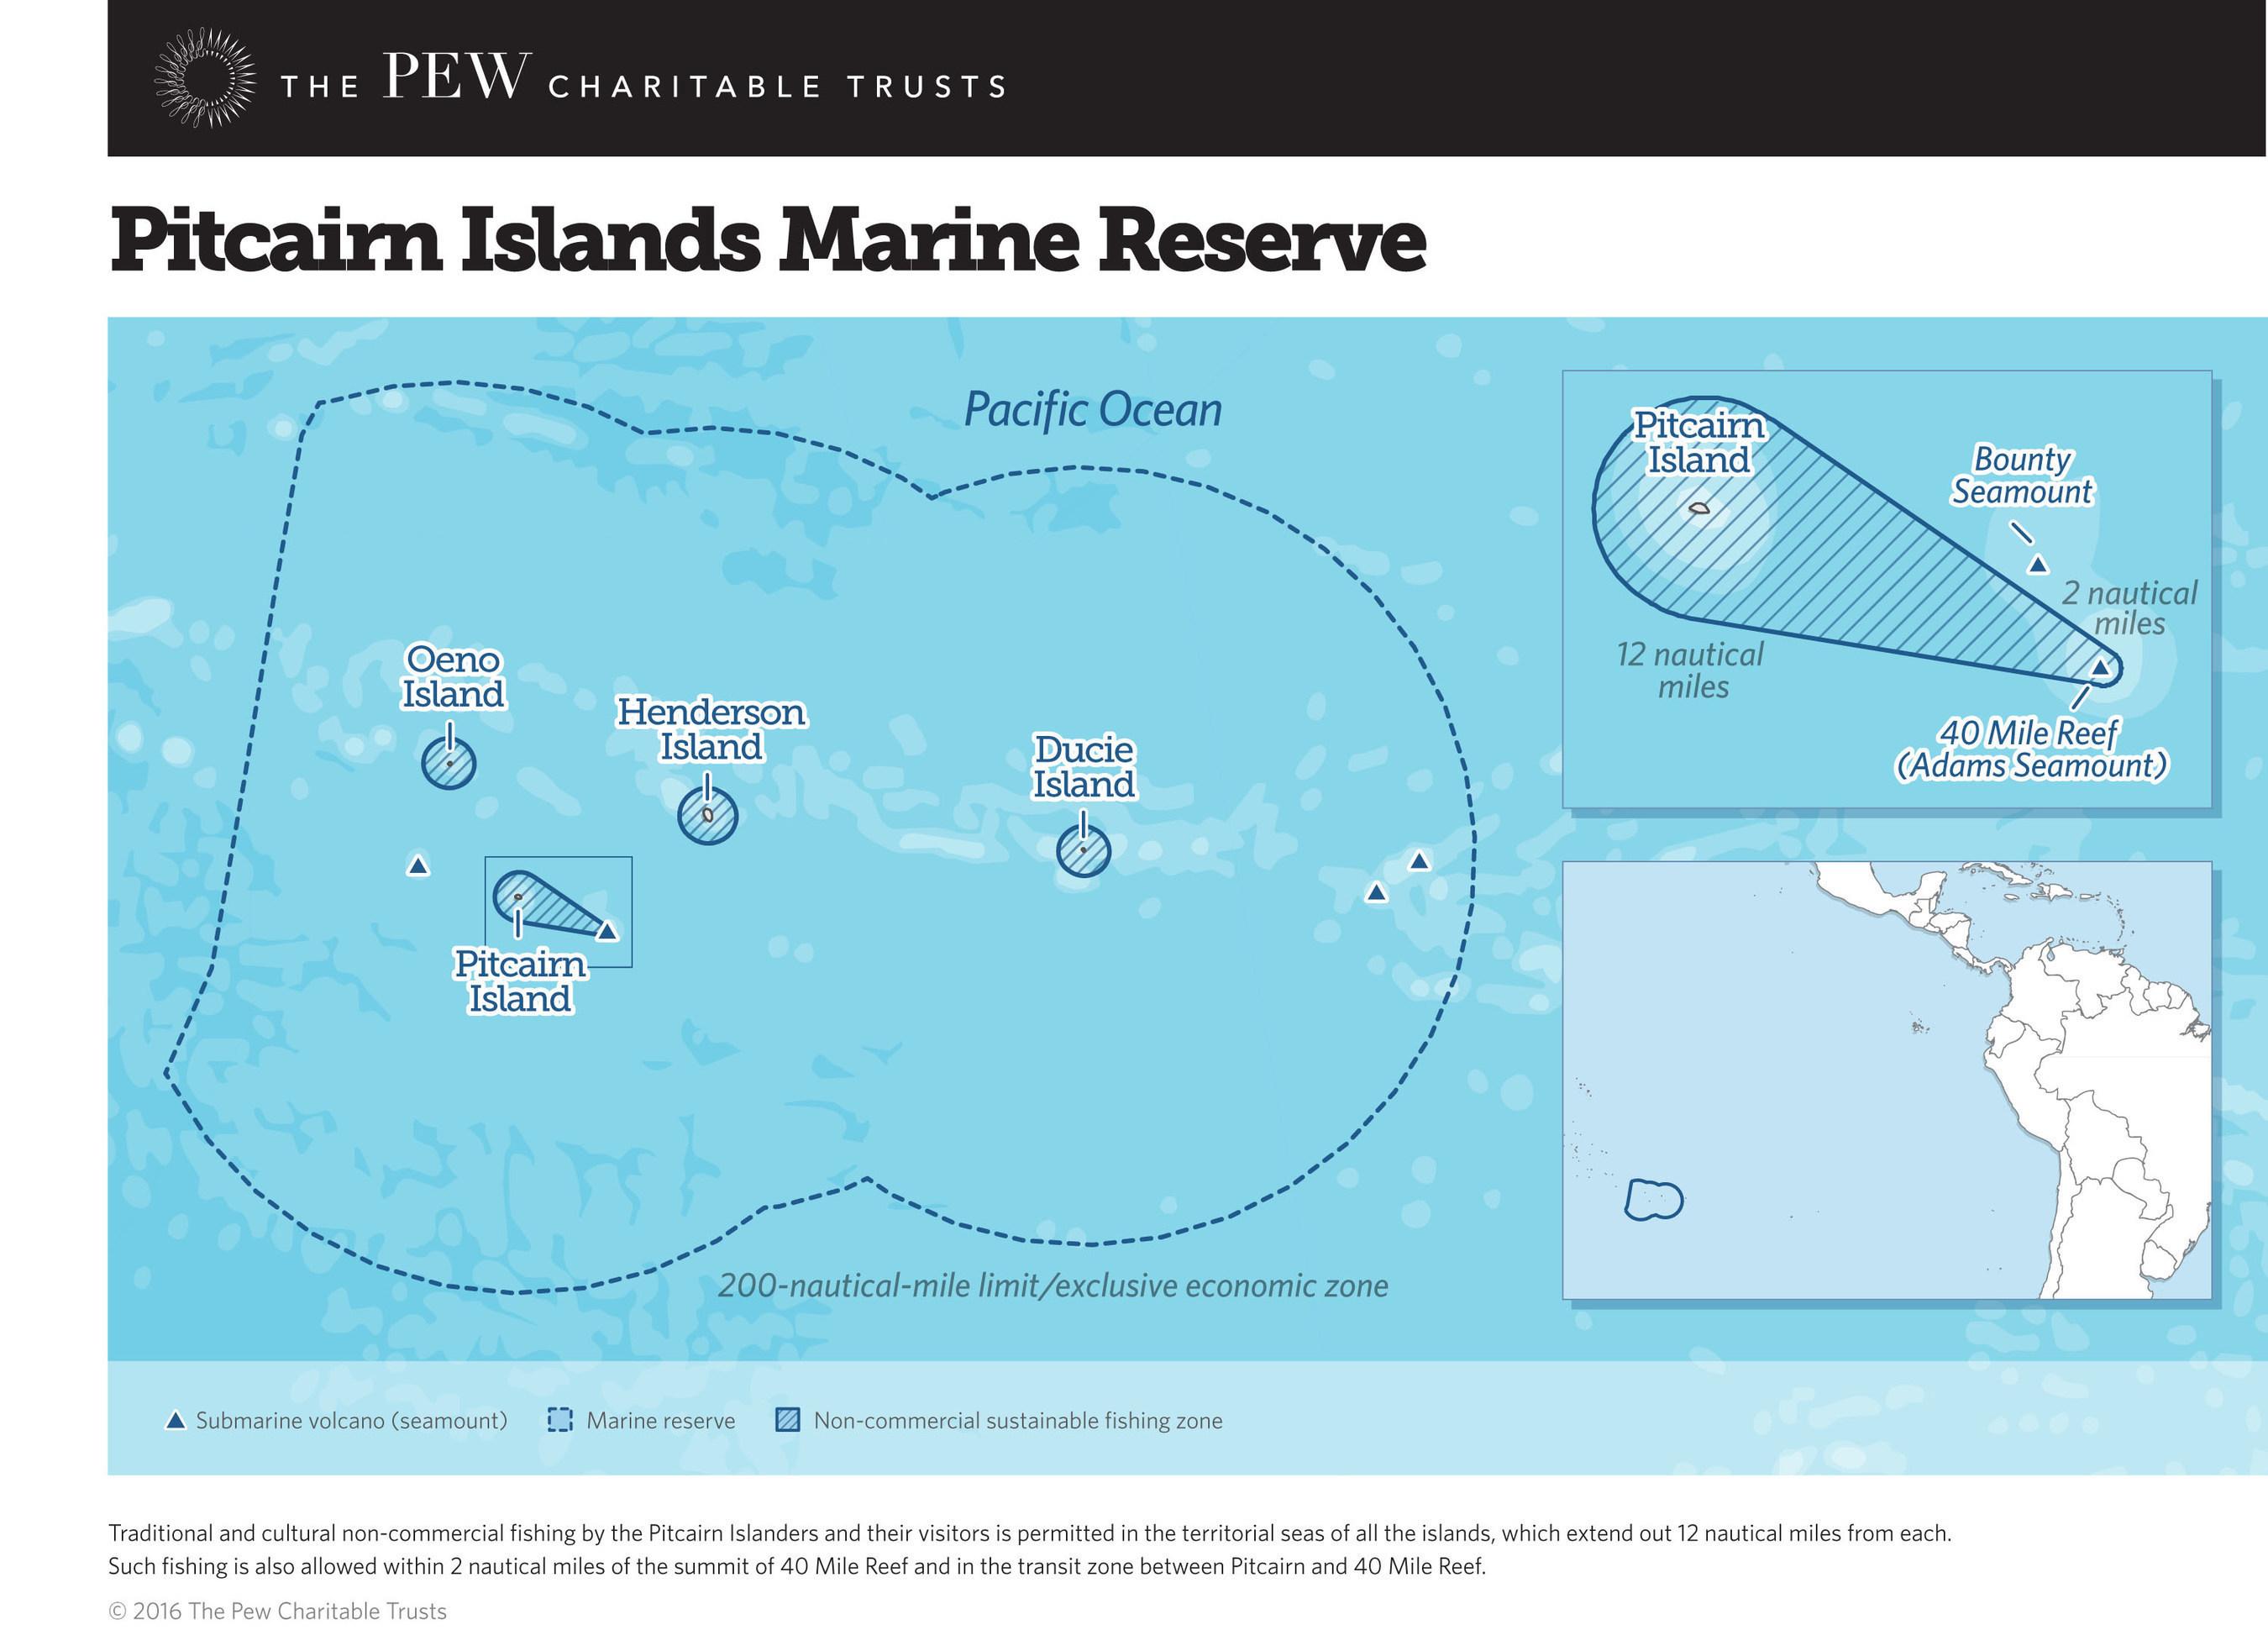 Pitcairn Islands Marine Reserve Map